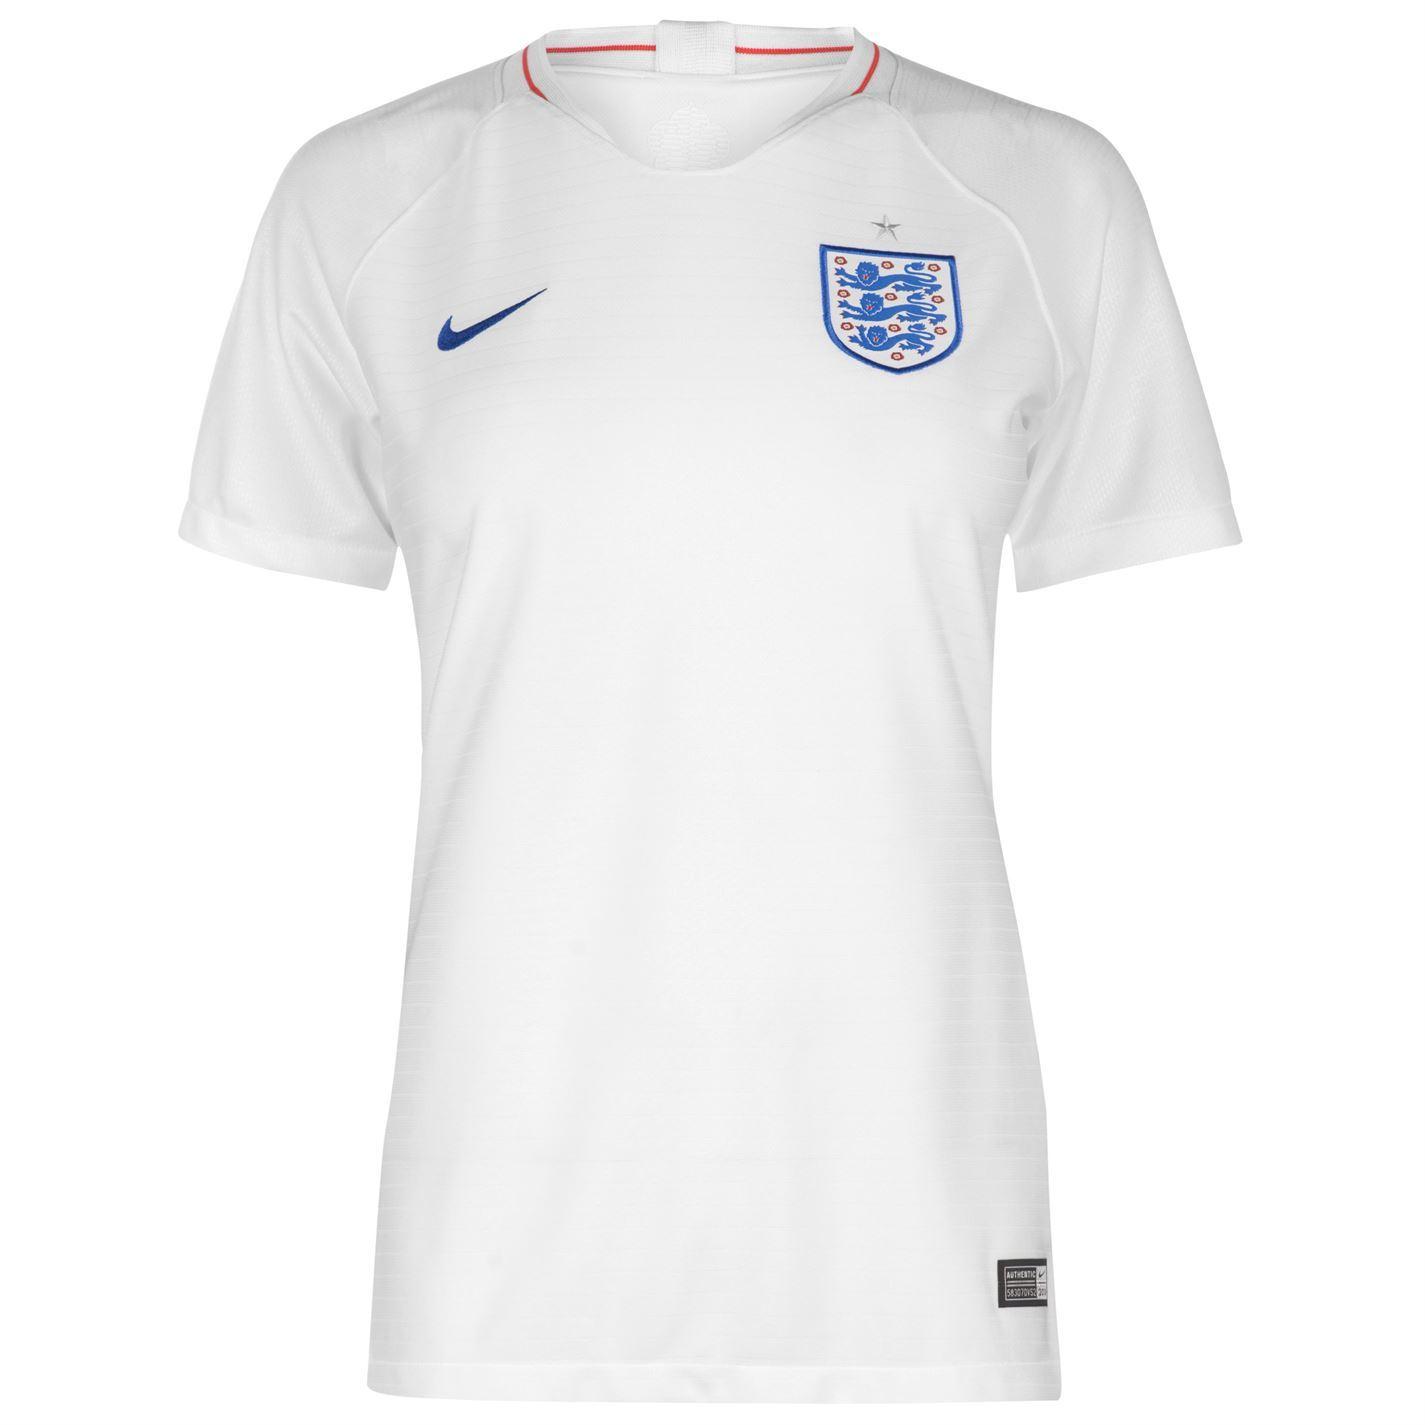 ... Nike England Home Jersey 2018 Womens White Blue Football Soccer Top  Shirt Strip ... b117c646b